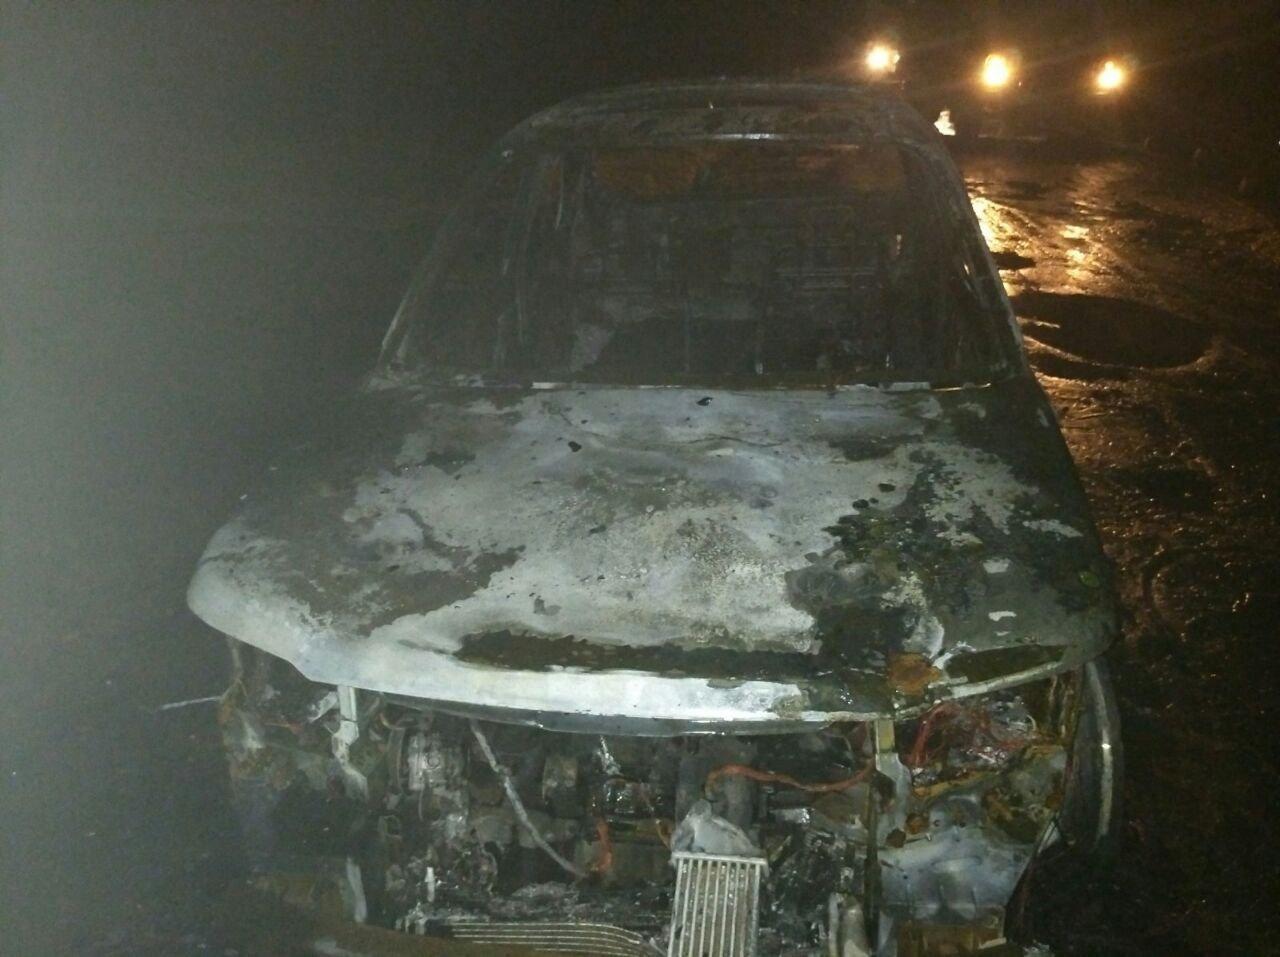 В Харькове сгорел Land Rover, не исключен поджог (фото)